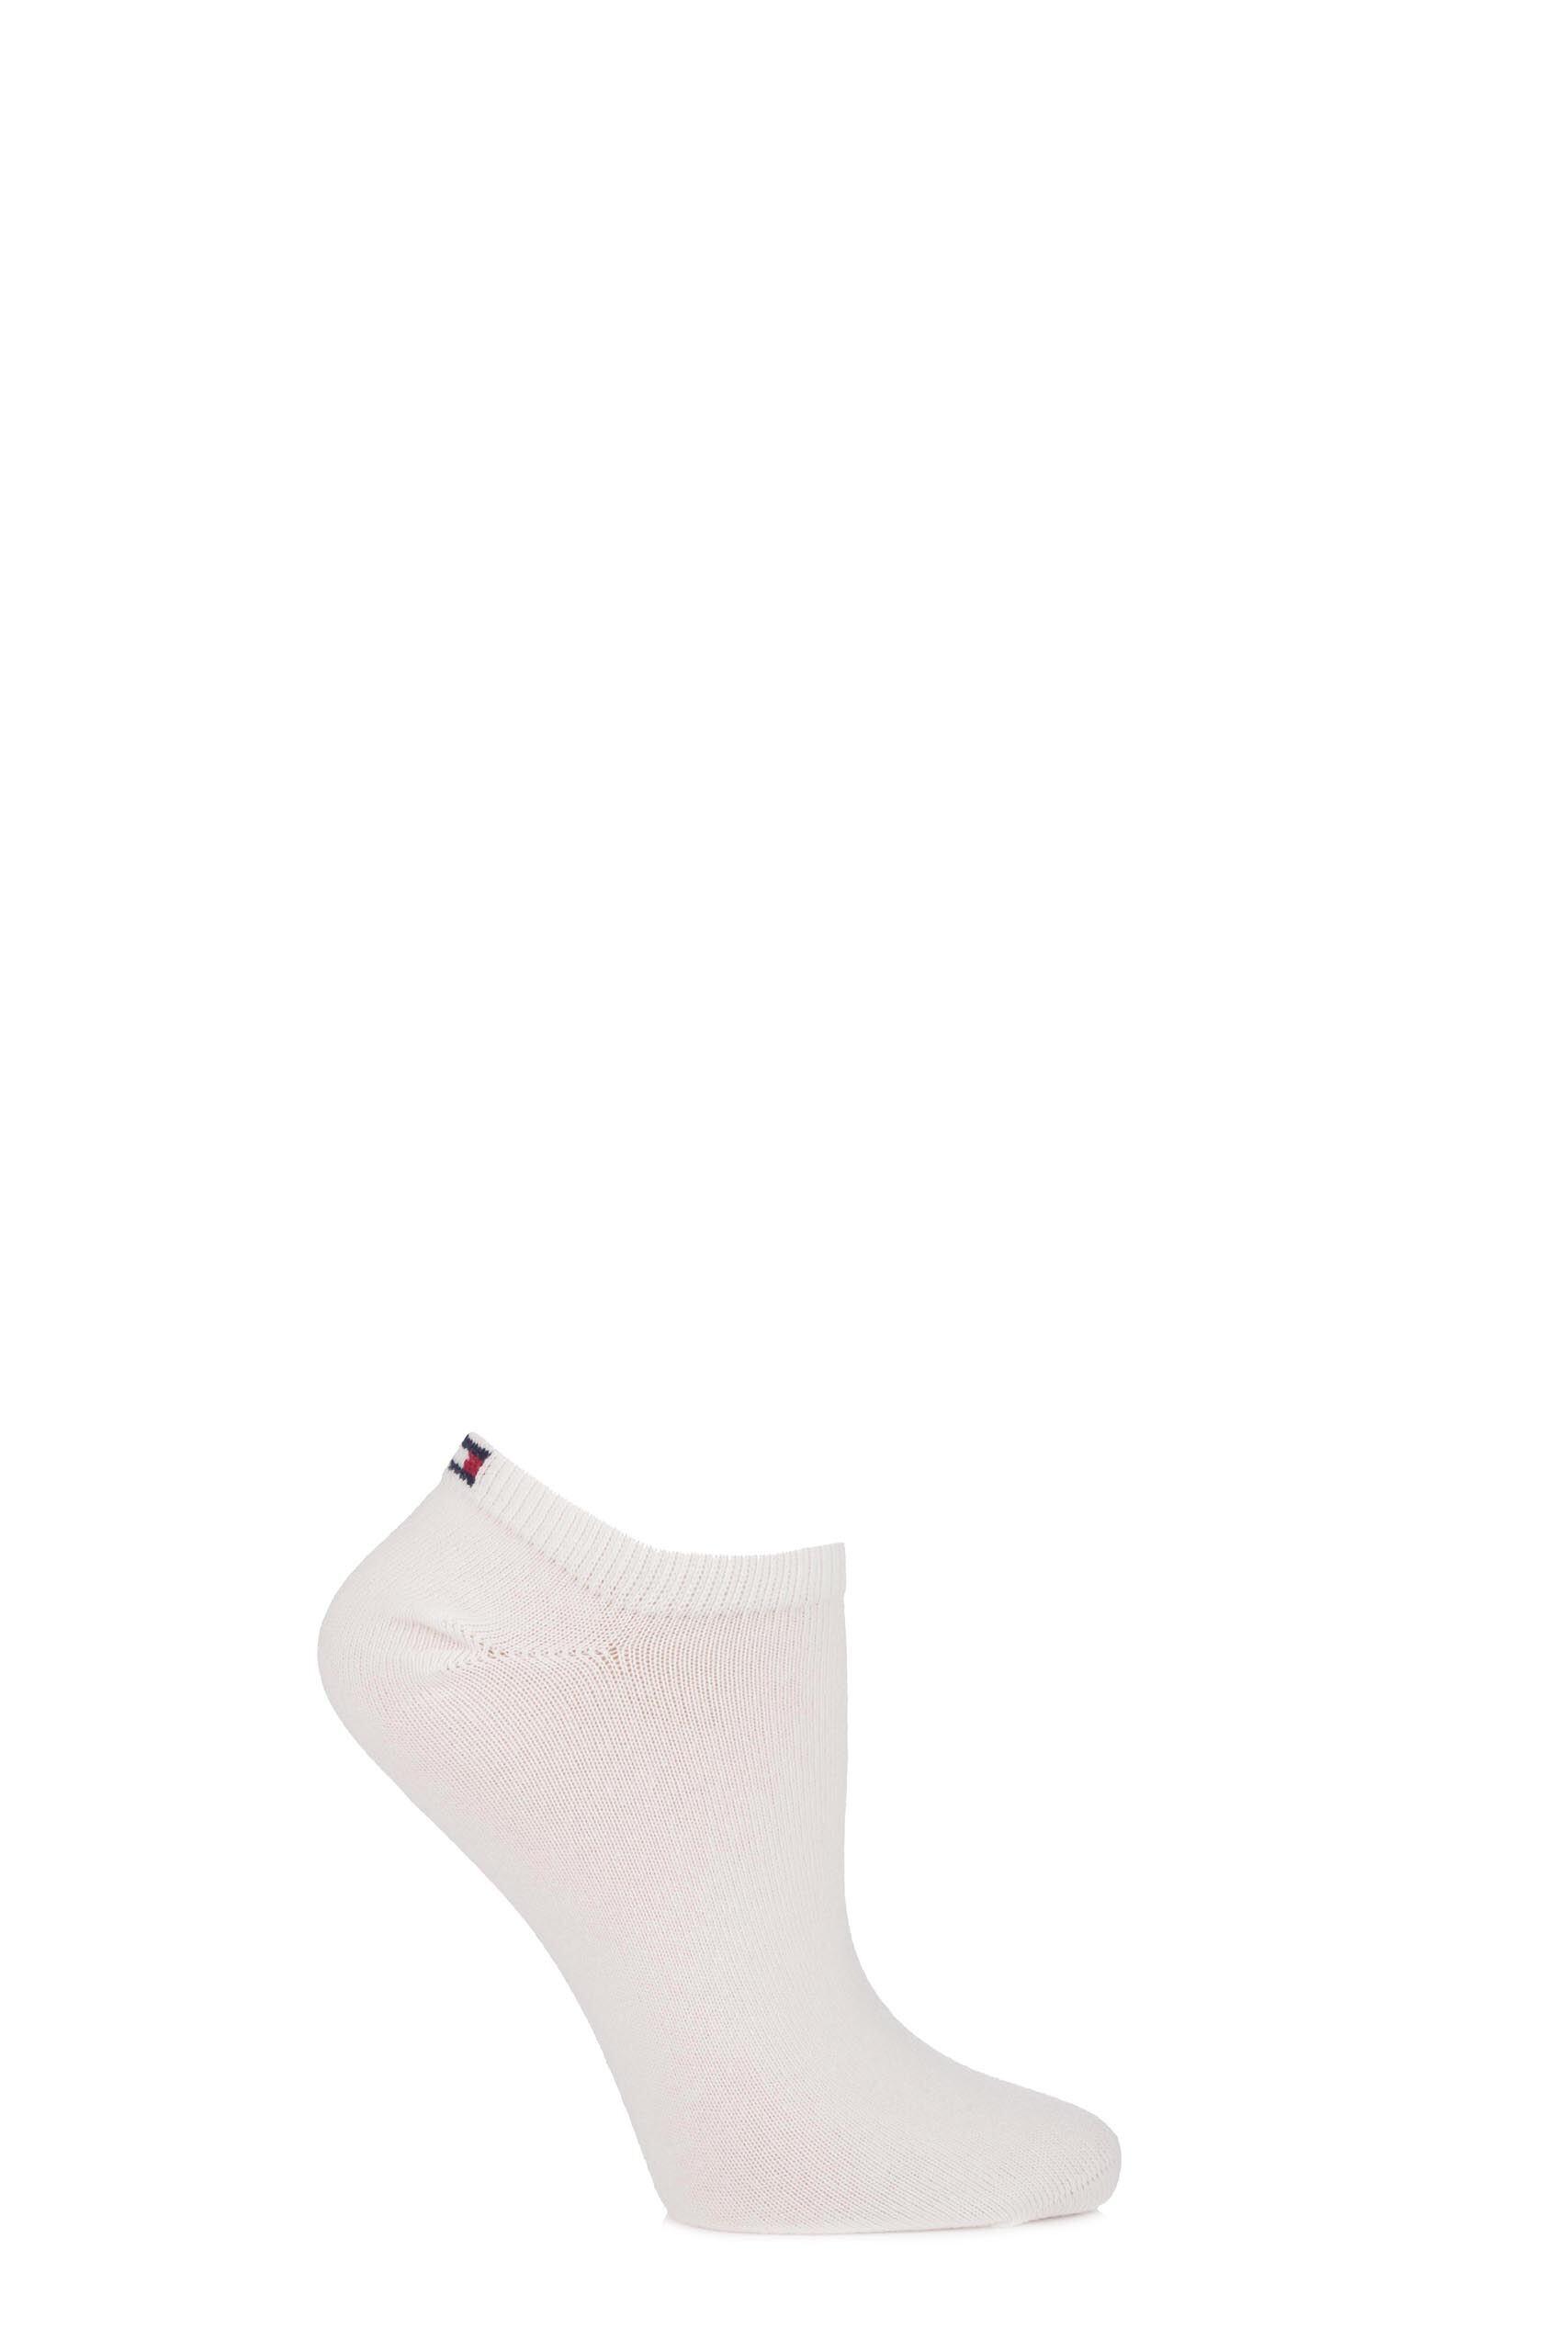 2 Pair Whisper White Plain Cotton Sneaker Socks Ladies 2.5-5 Ladies - Tommy Hilfiger